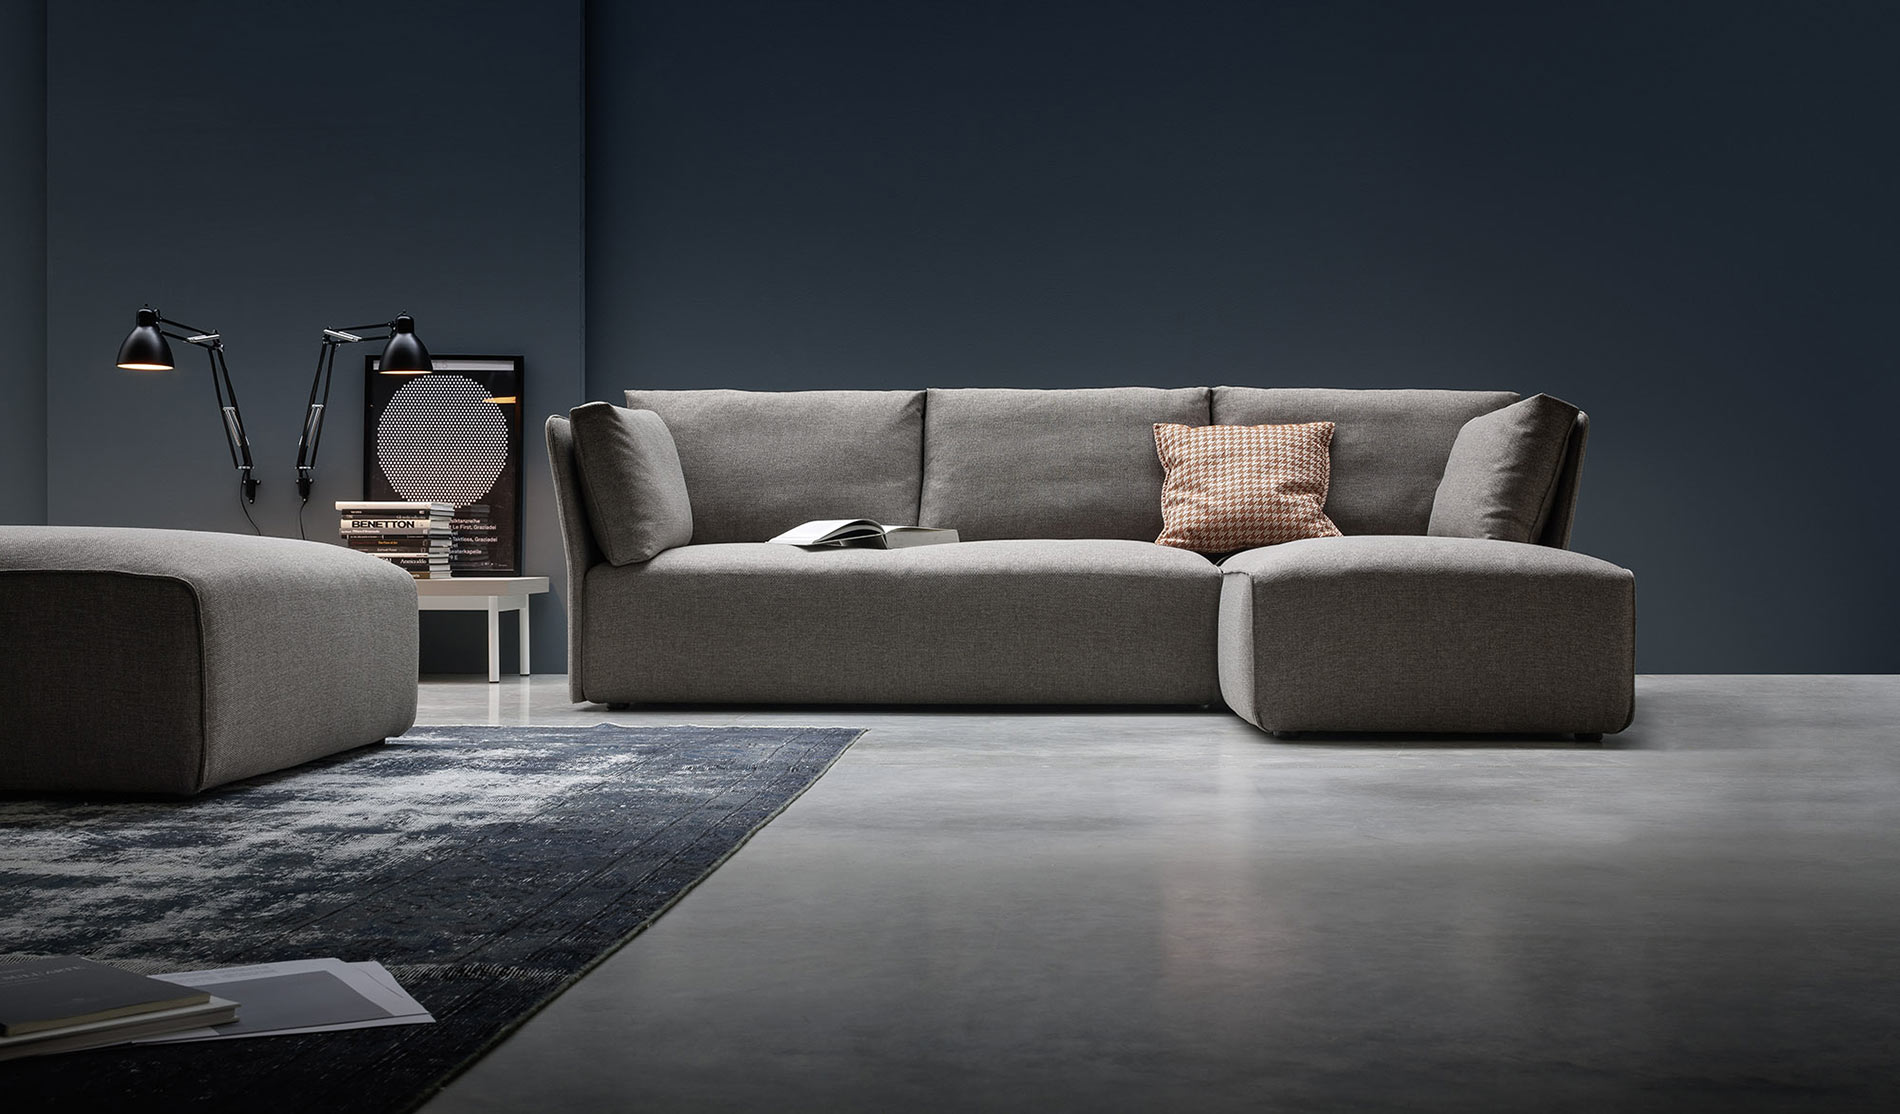 kleines ecksofa affordable kleines ecksofa mit sofa mit. Black Bedroom Furniture Sets. Home Design Ideas